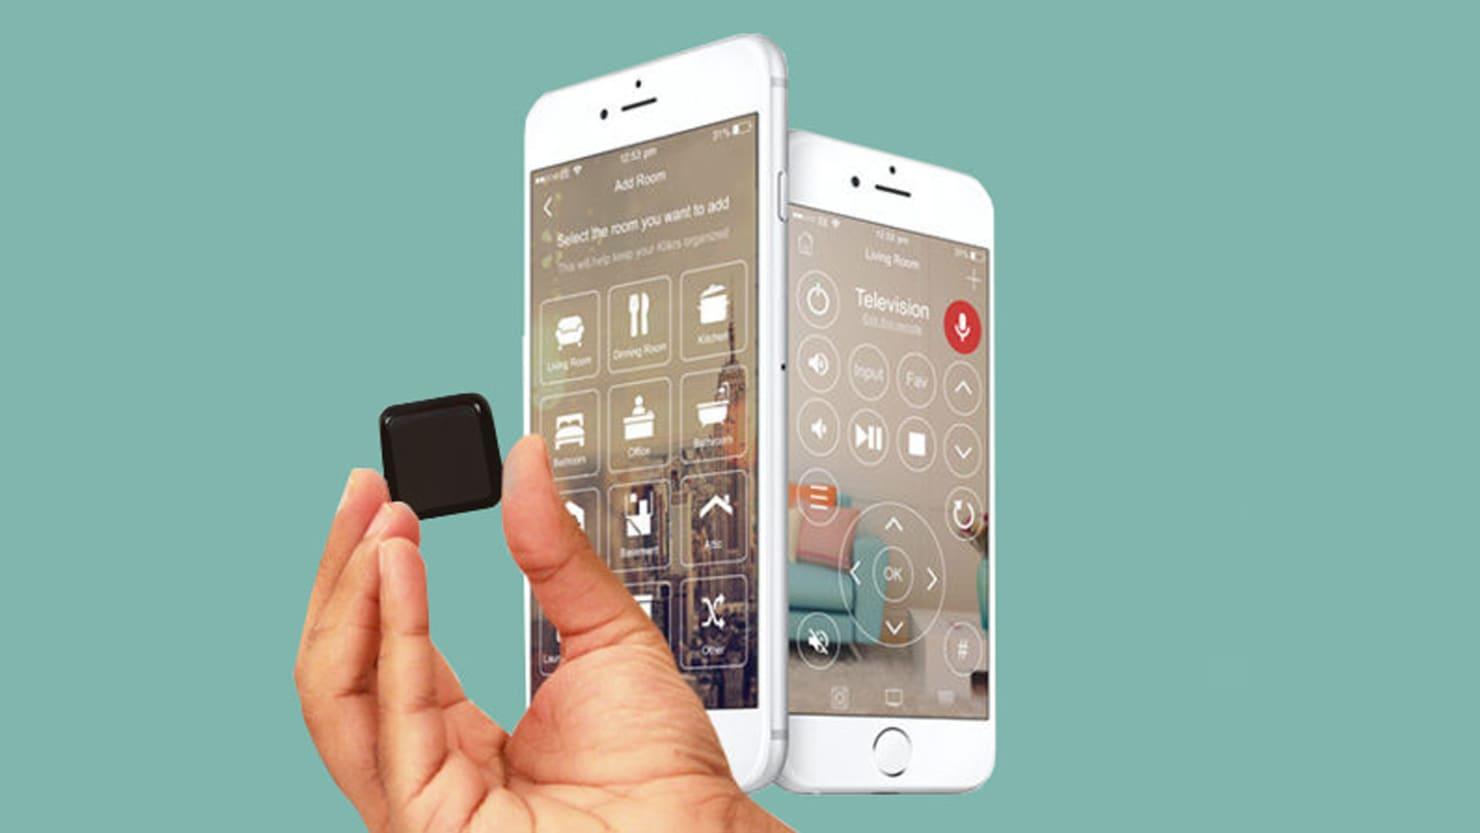 Transform Your Smartphone Into A Universal Remote